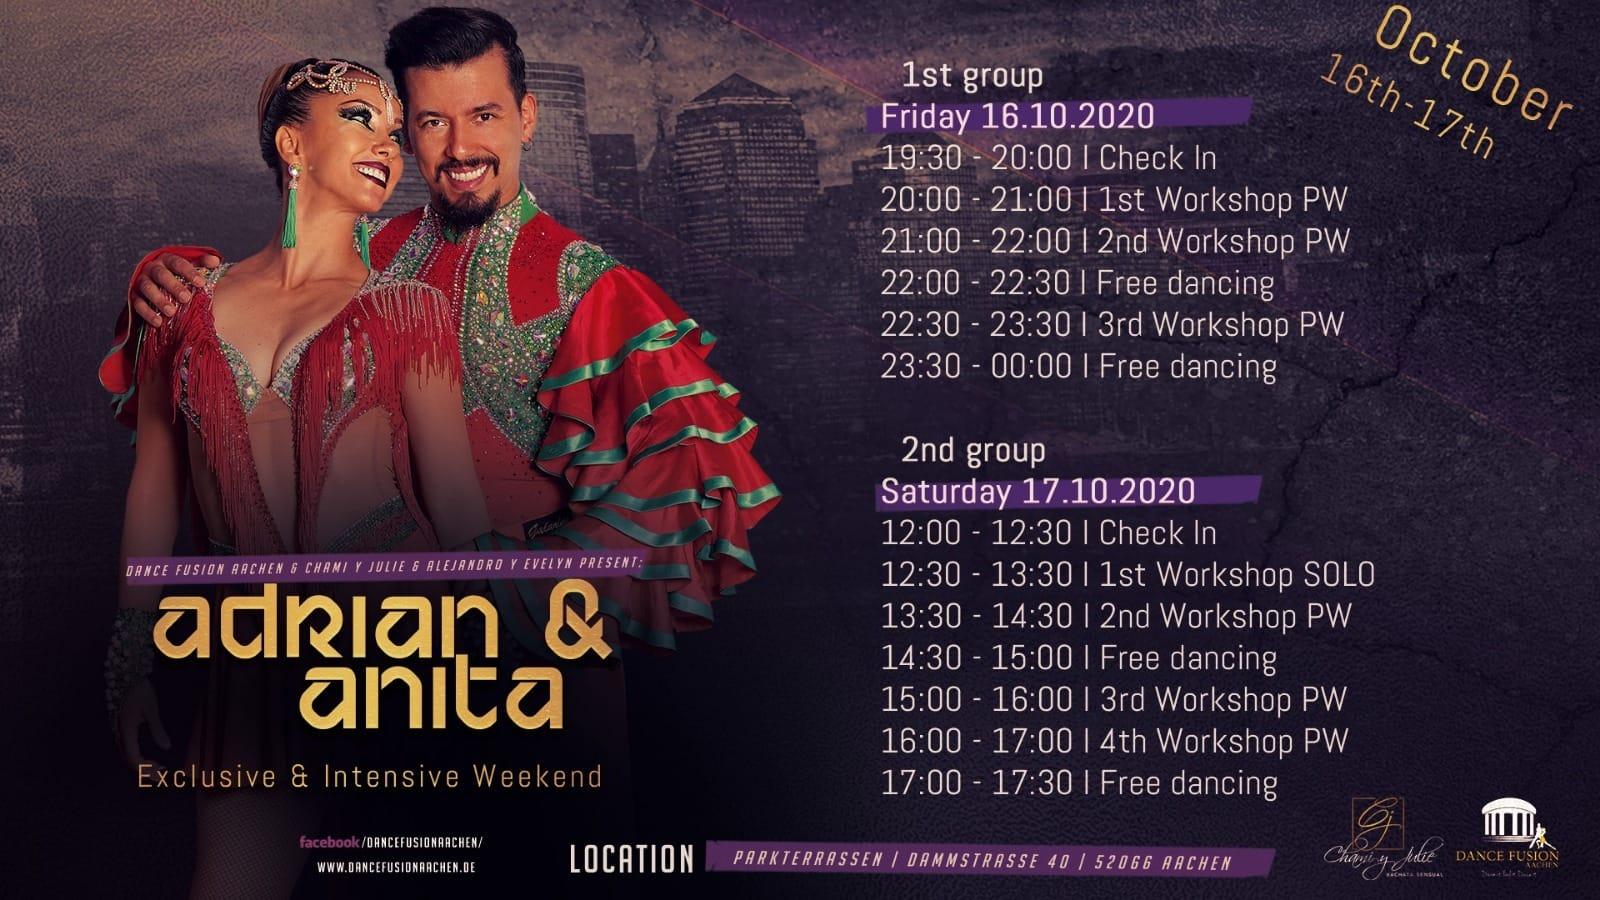 Adrian & Anita Exclusive & Intensive Weekend